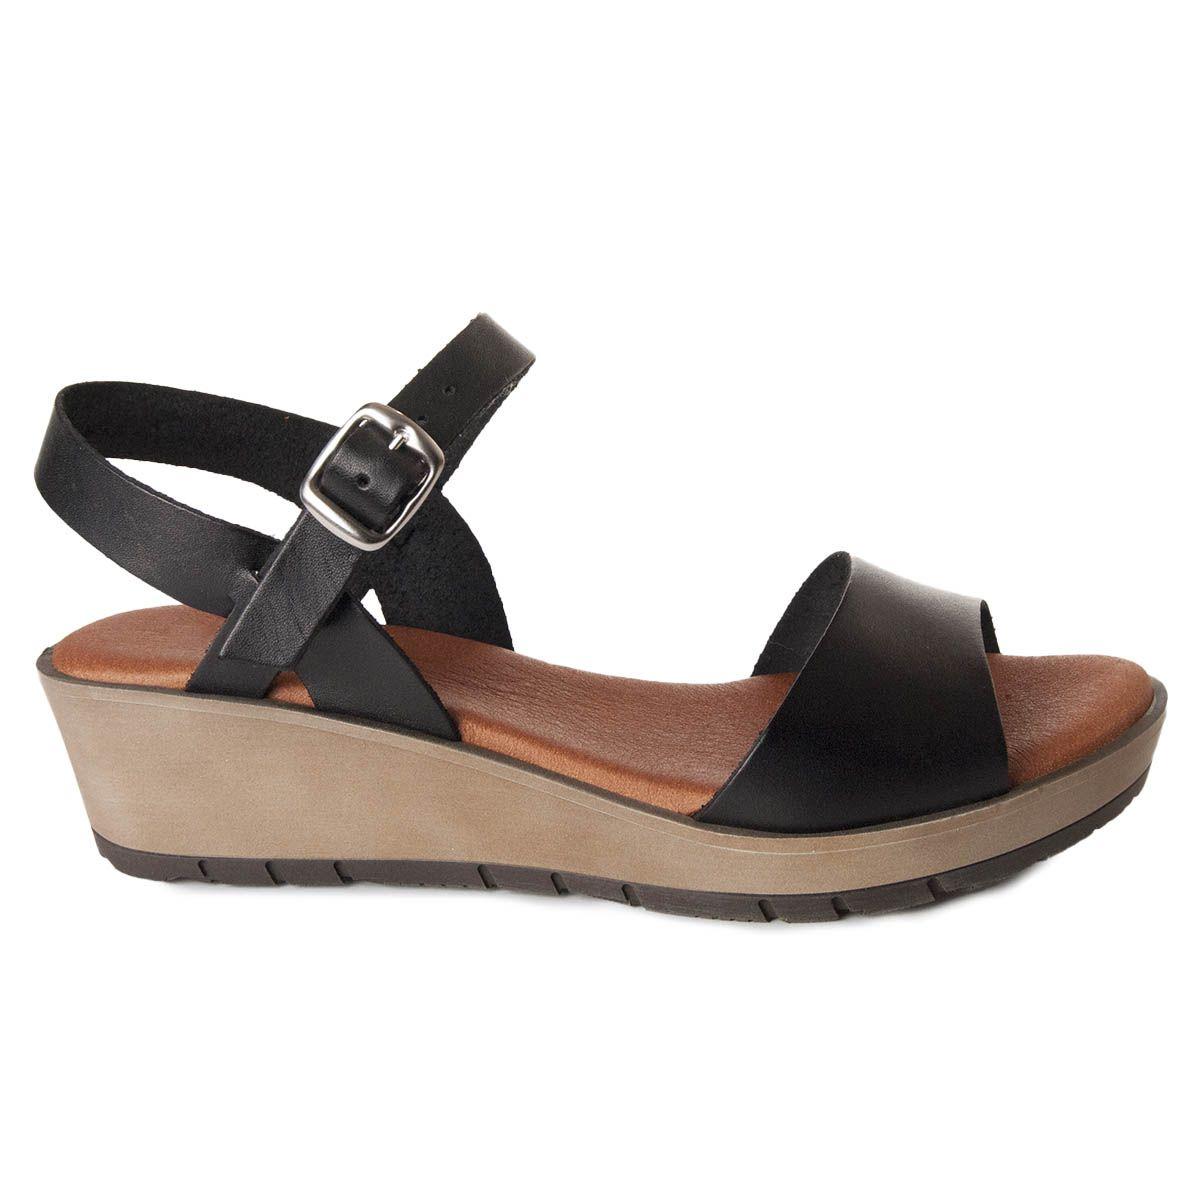 Leindia Wedge Sandal in Black